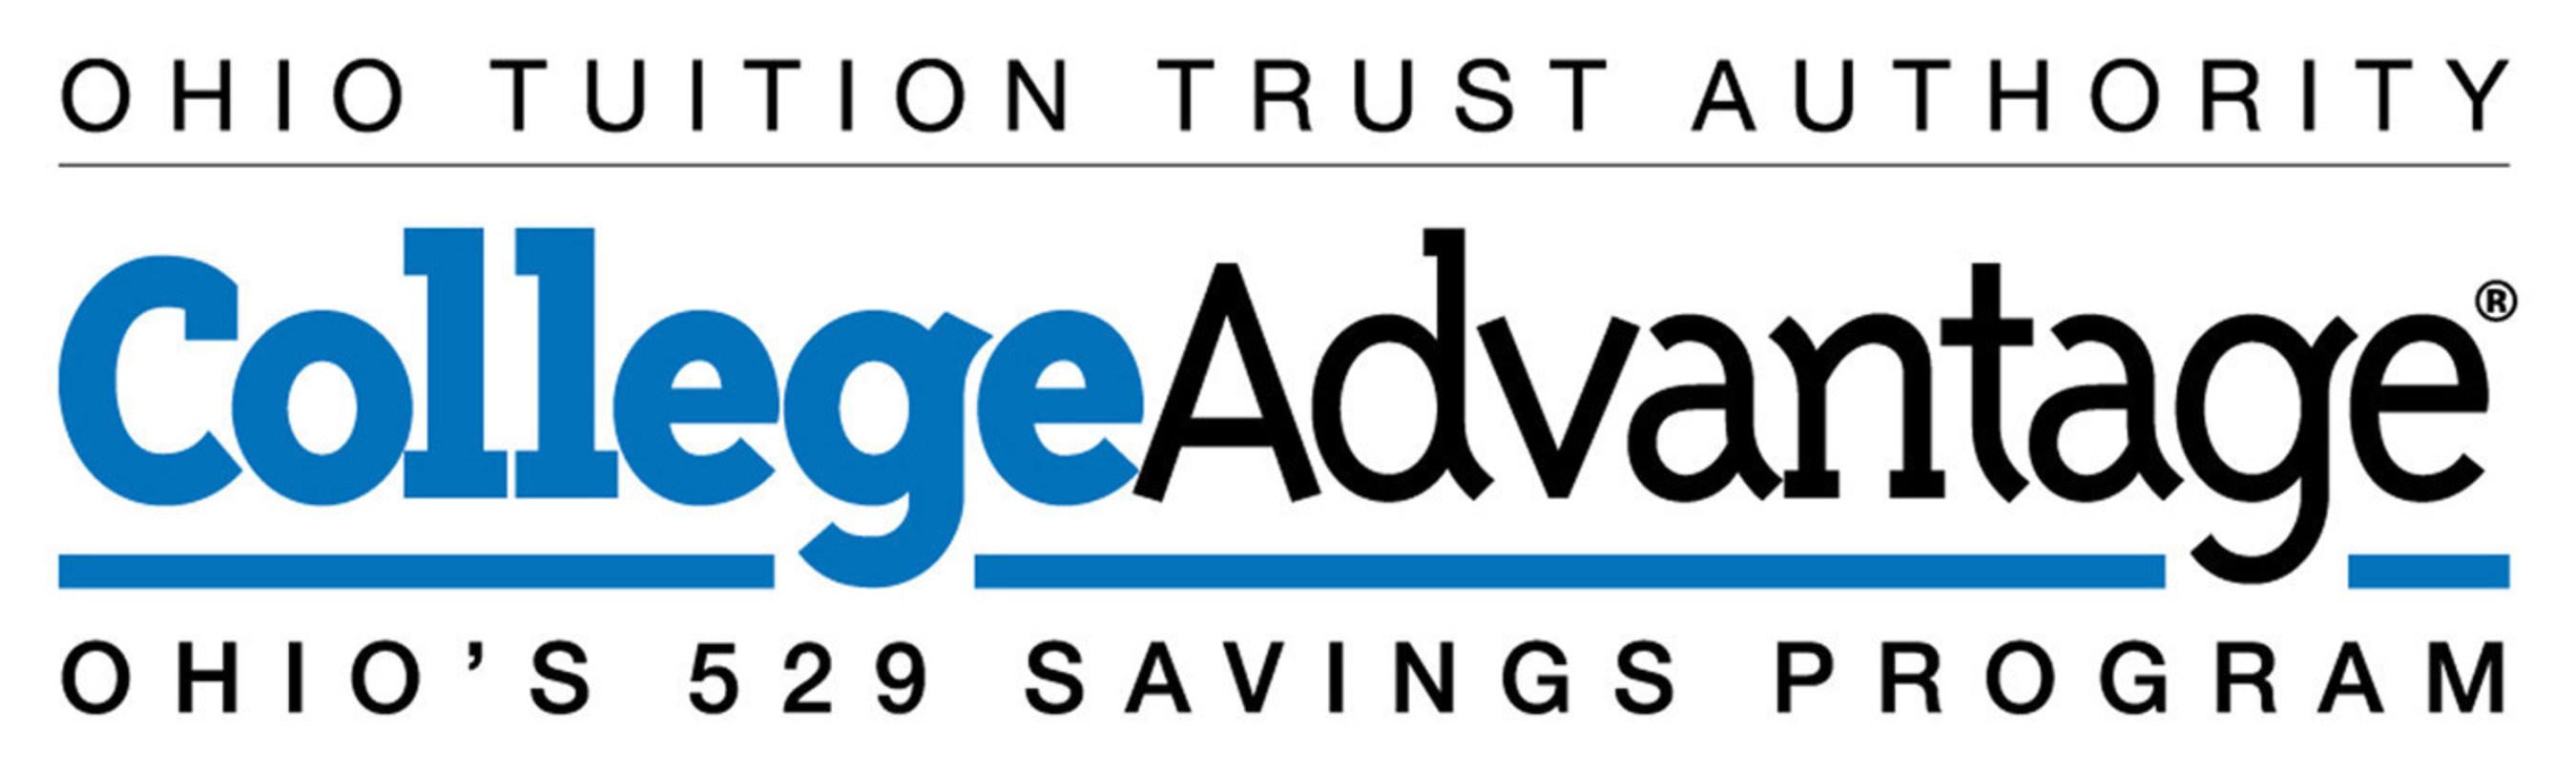 Ohio Tuition Trust Authority CollegeAdvantage logo